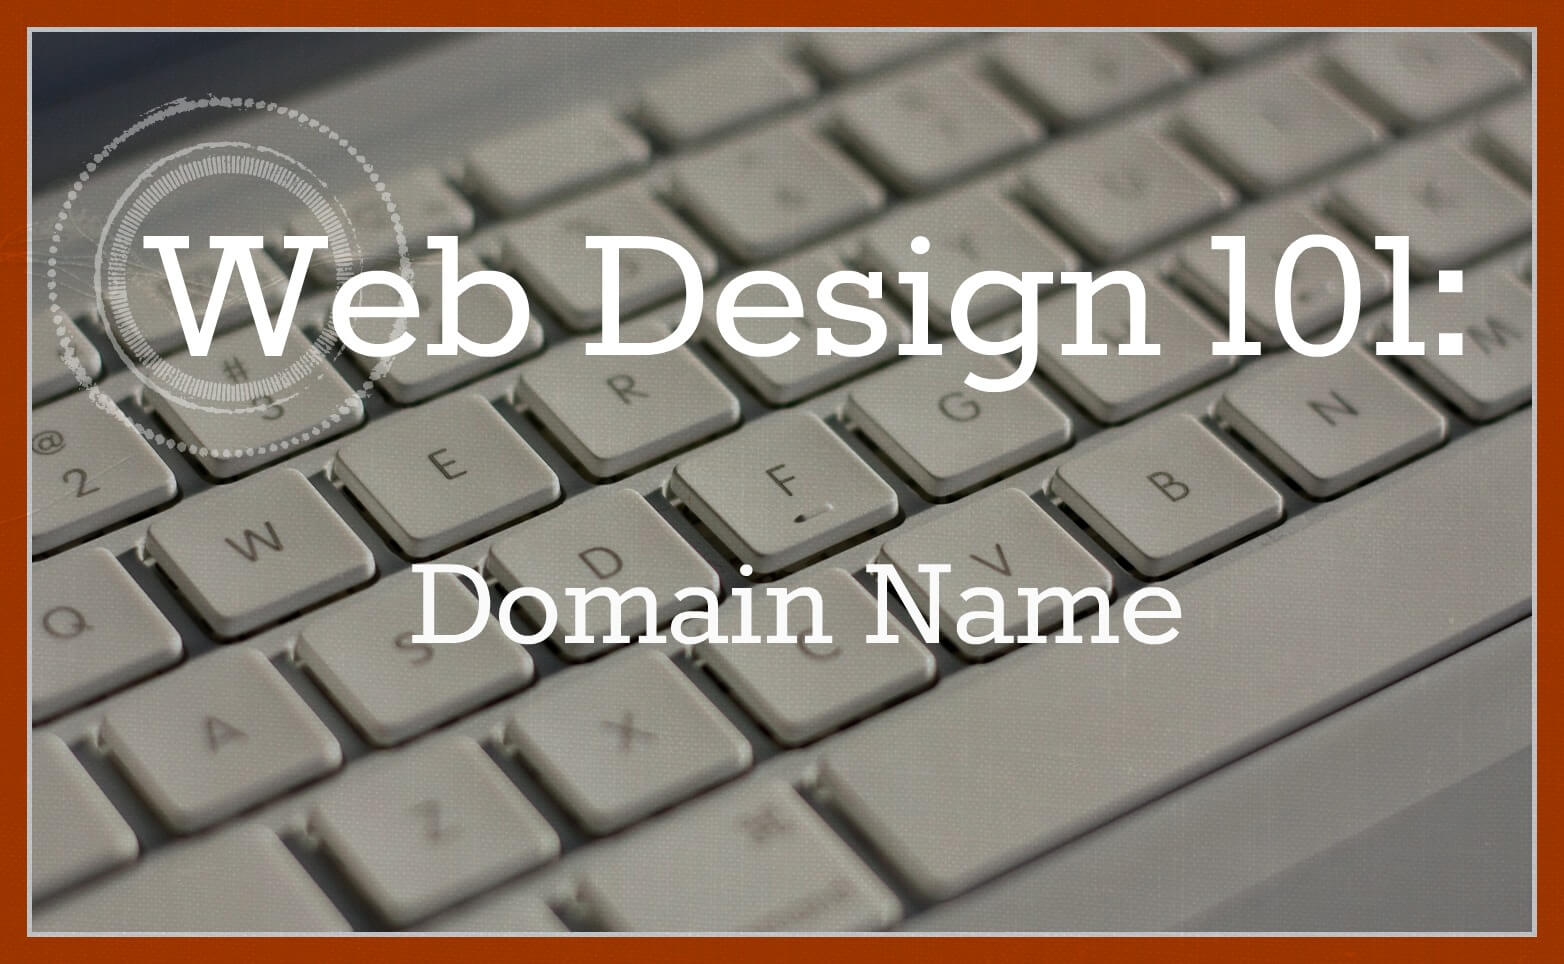 Web Design 101 Domain Name  Clarity Creative Group